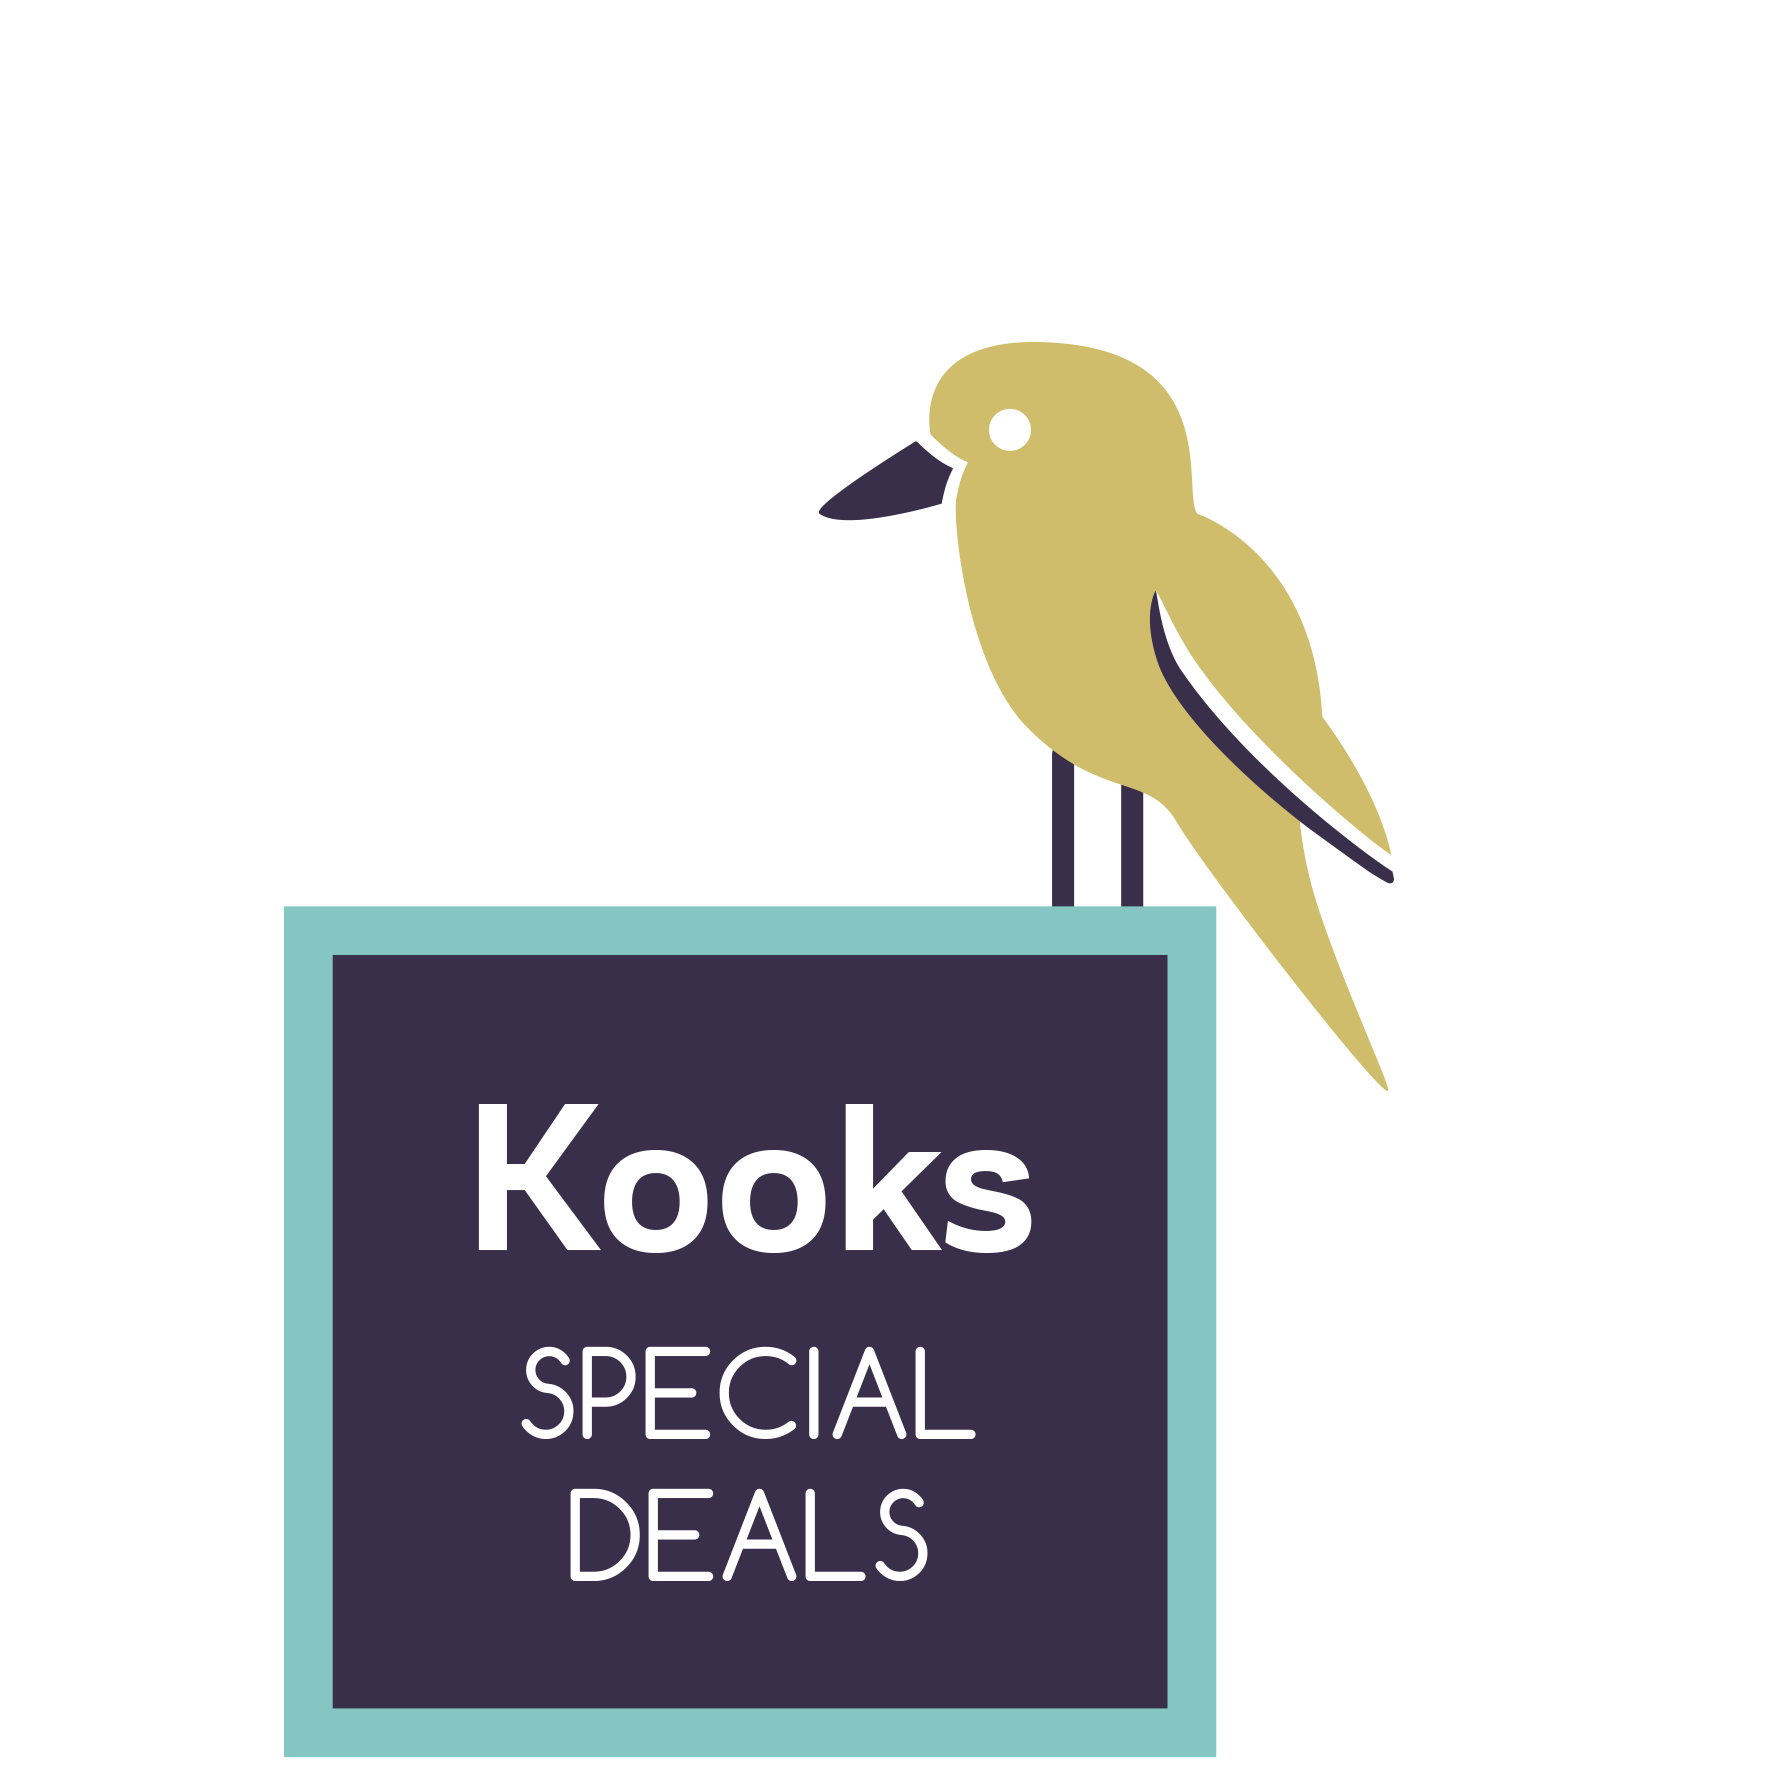 kooks-sign-special-deals.png